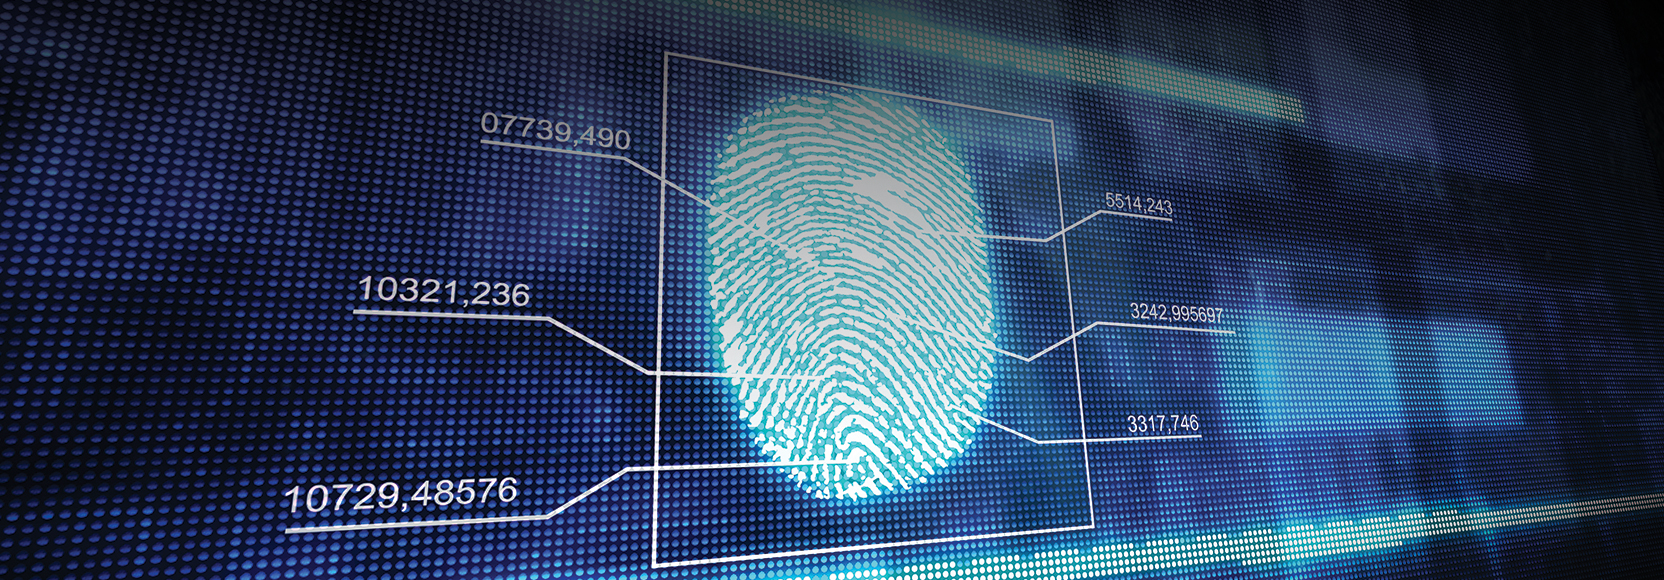 Malta Data Protection Lawyers